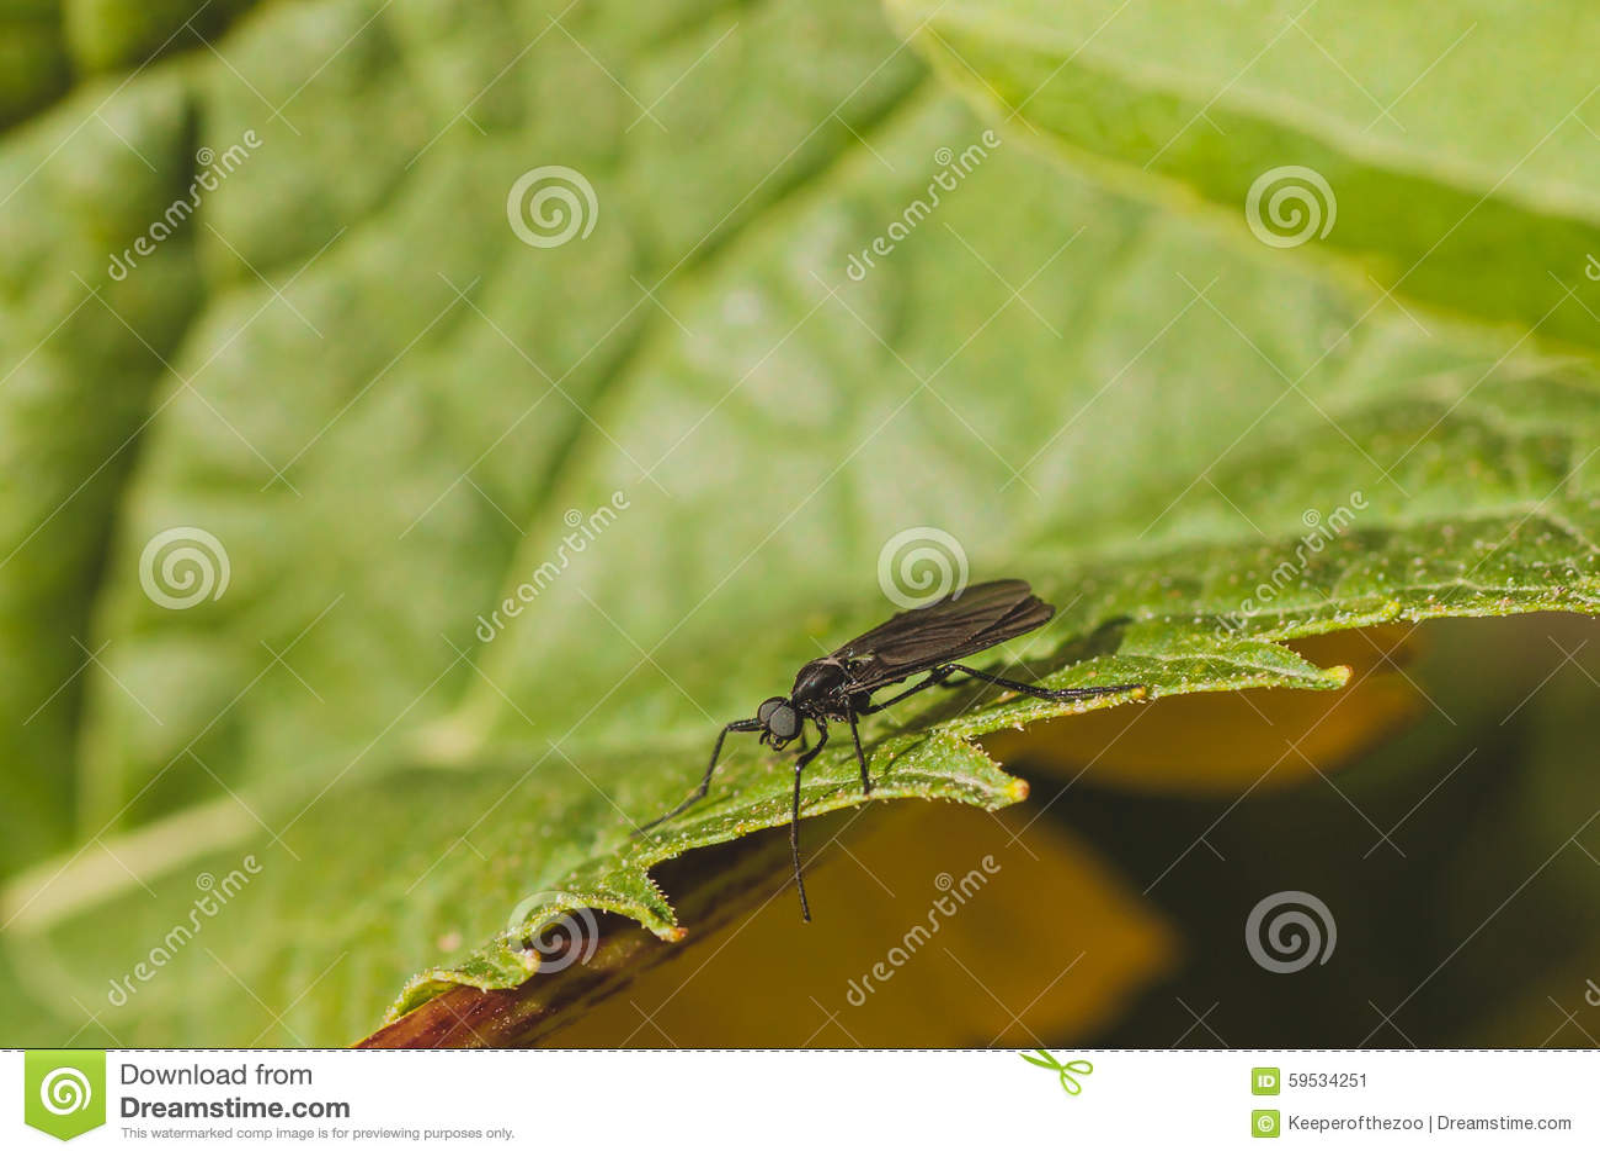 March Fly on Green Leaf